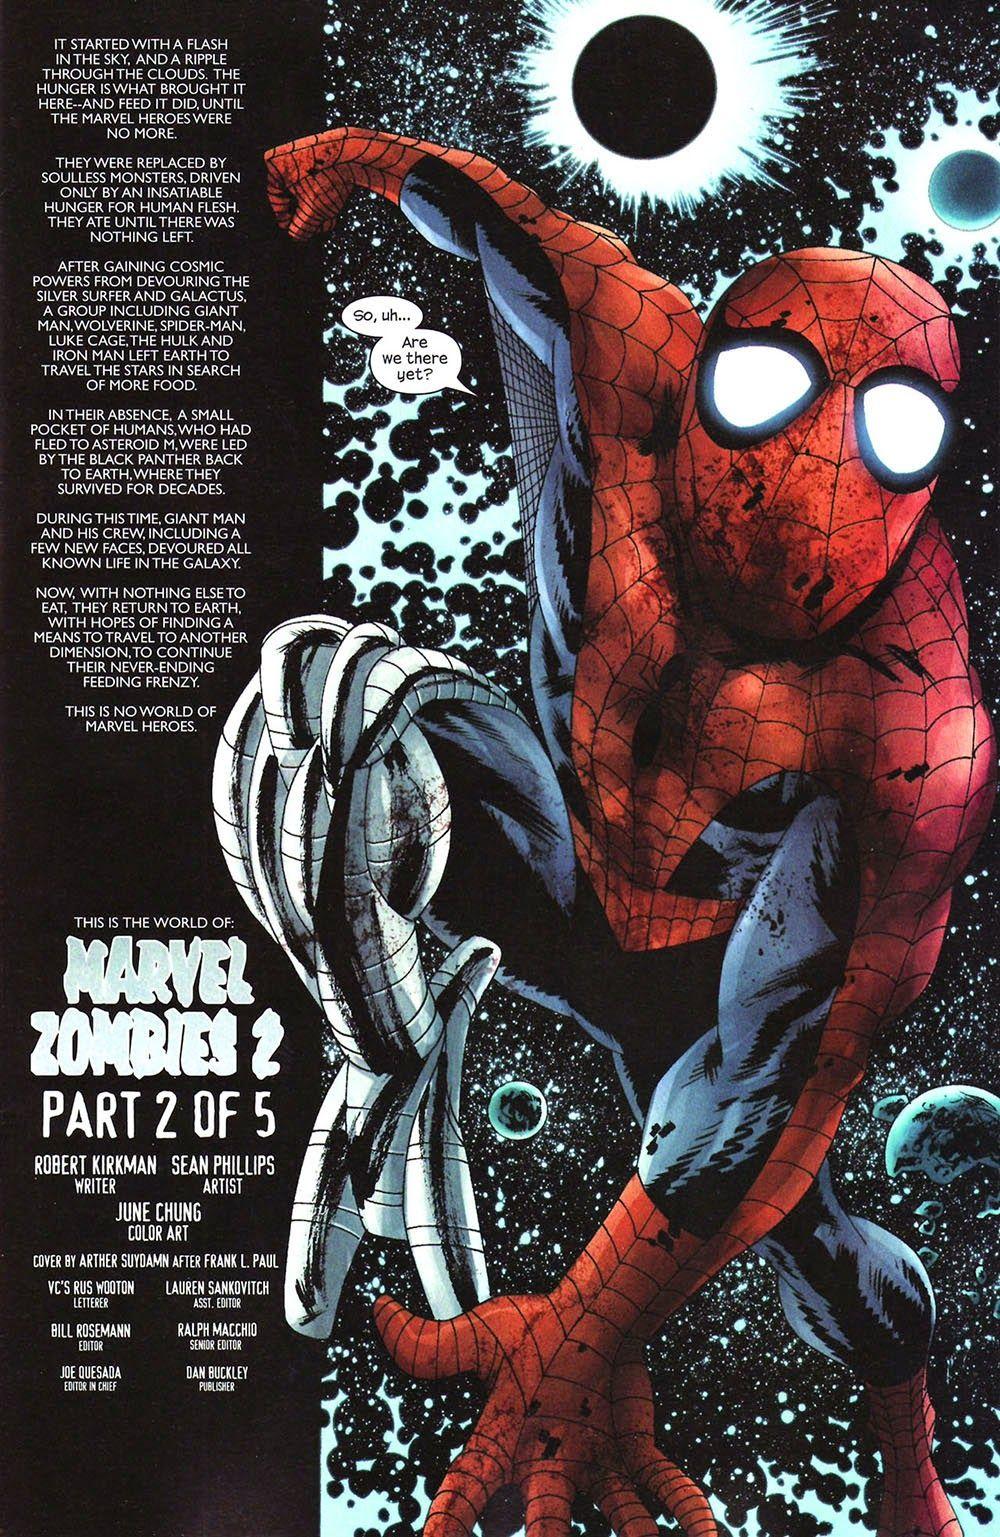 Marvel Zombies Ii 02 Viewcomic Reading Comics Online For Free 2019 In 2021 Marvel Zombies Marvel Marvel Art